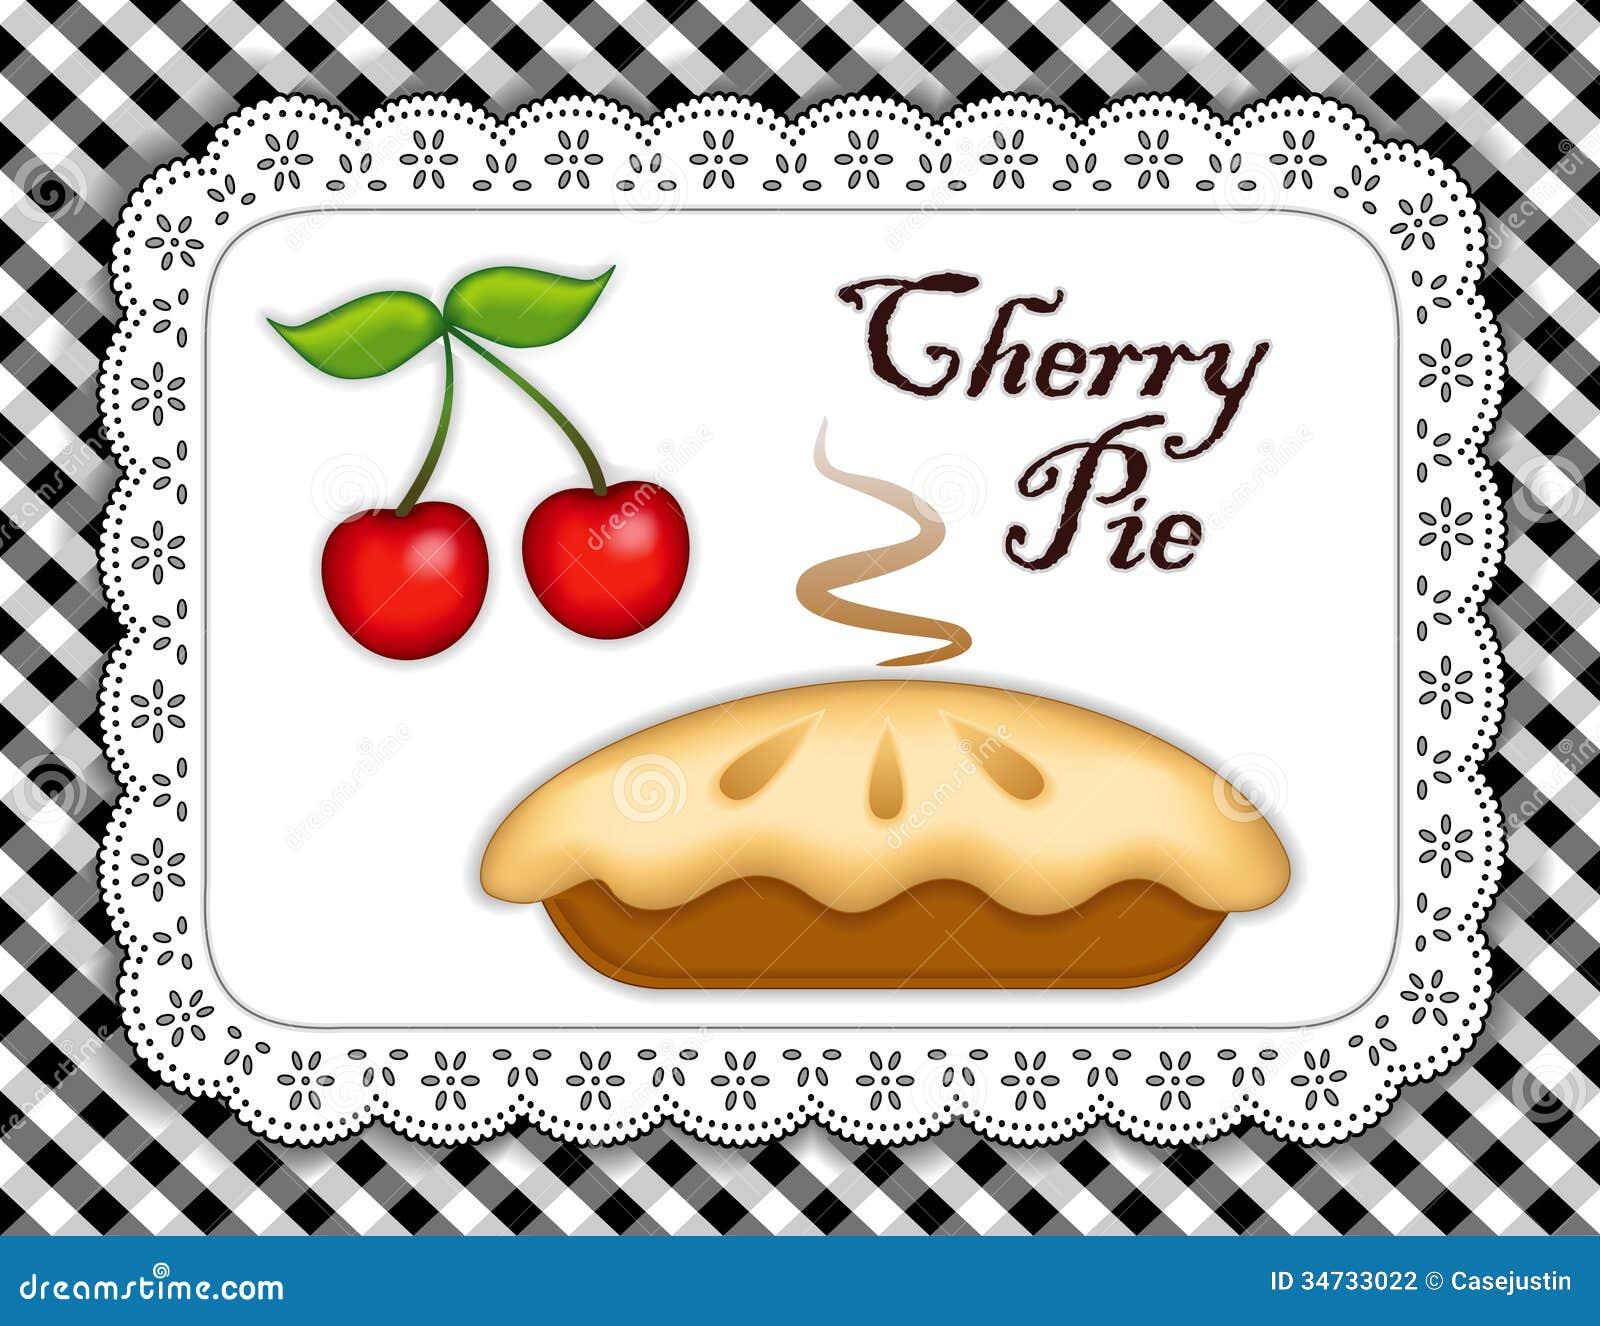 Cherry Pie, Lace Doily Place Mat, Black Gingham Stock ...